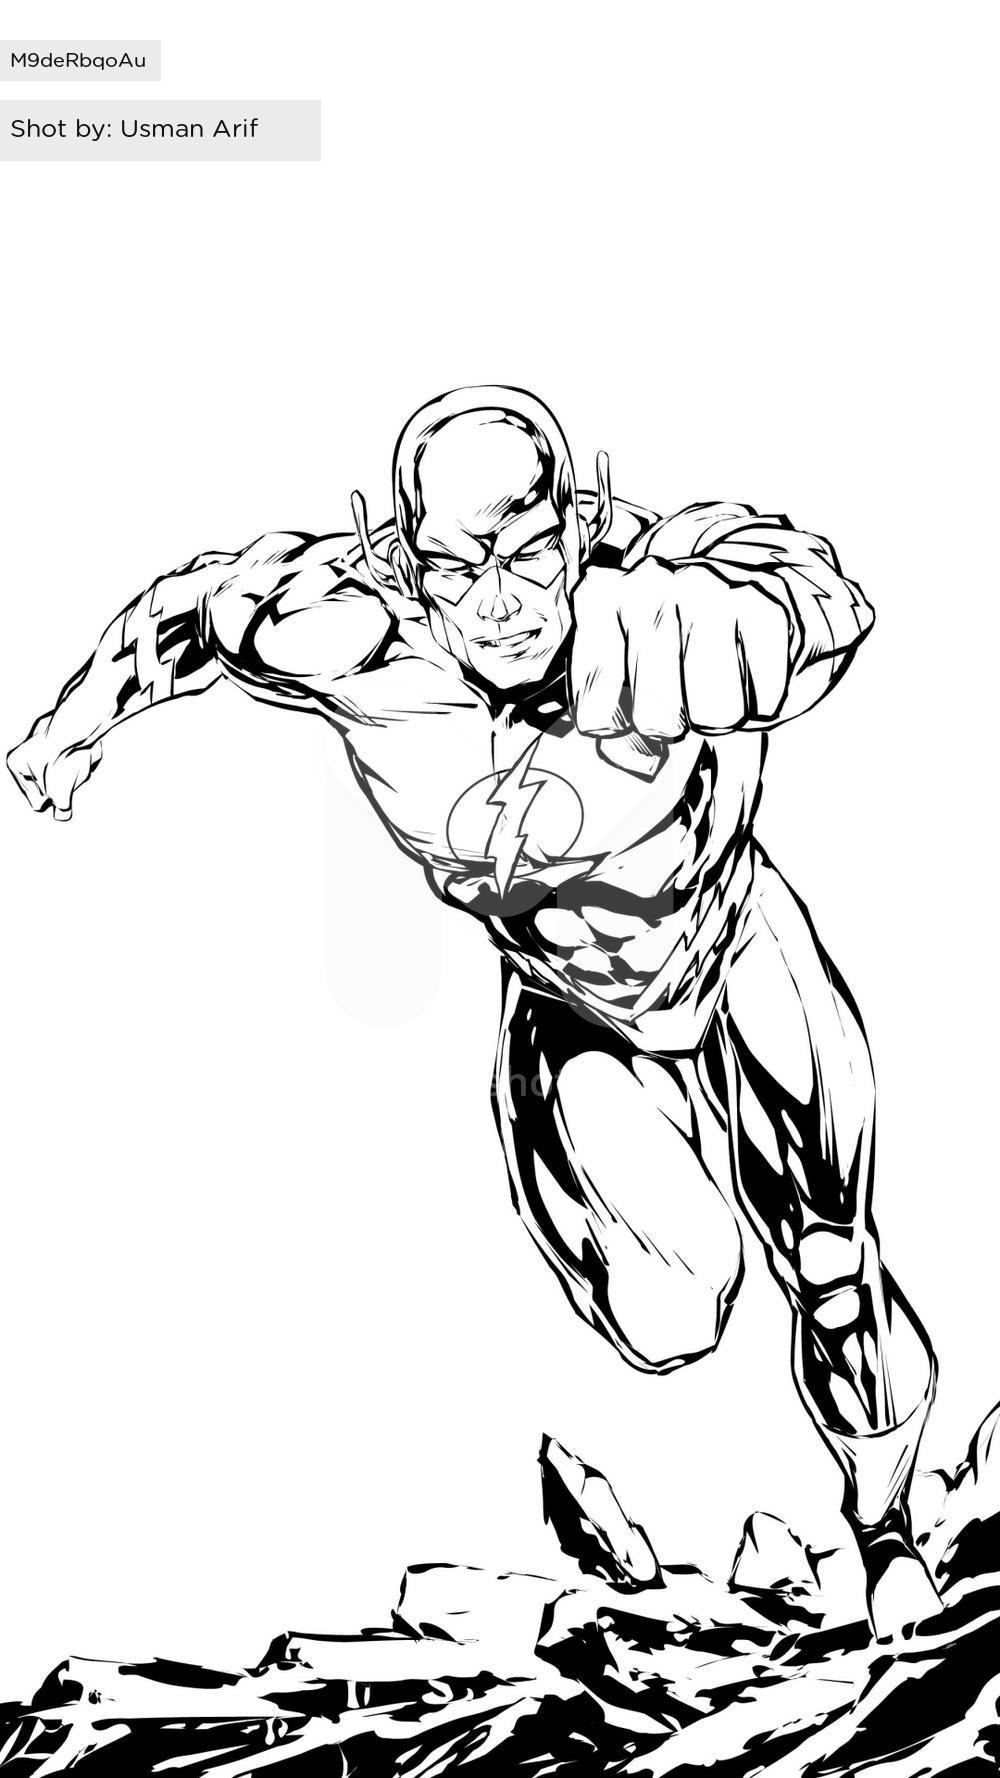 1000x1778 The Flash (Drawing) By Usman Arif